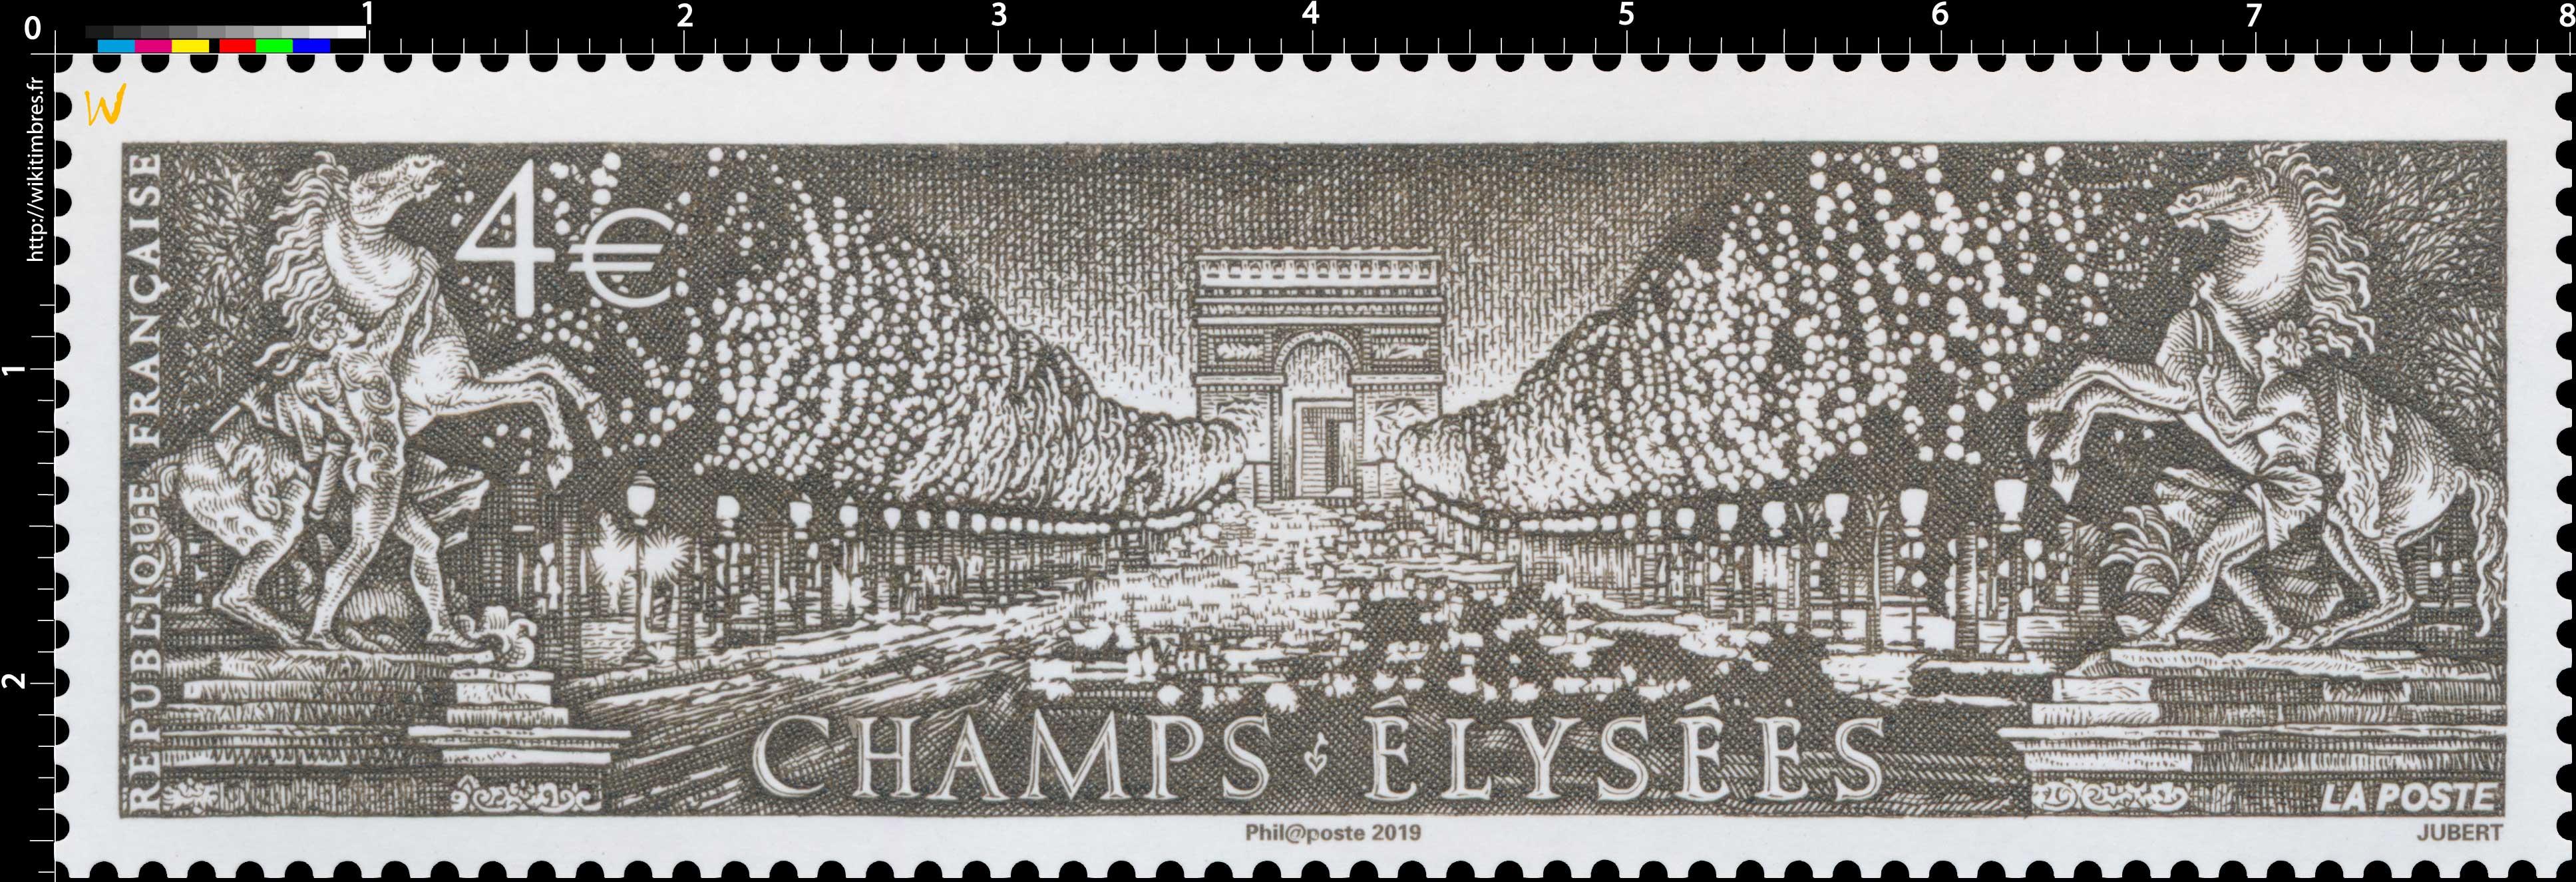 2019 CHAMPS-ÉLYSÉES